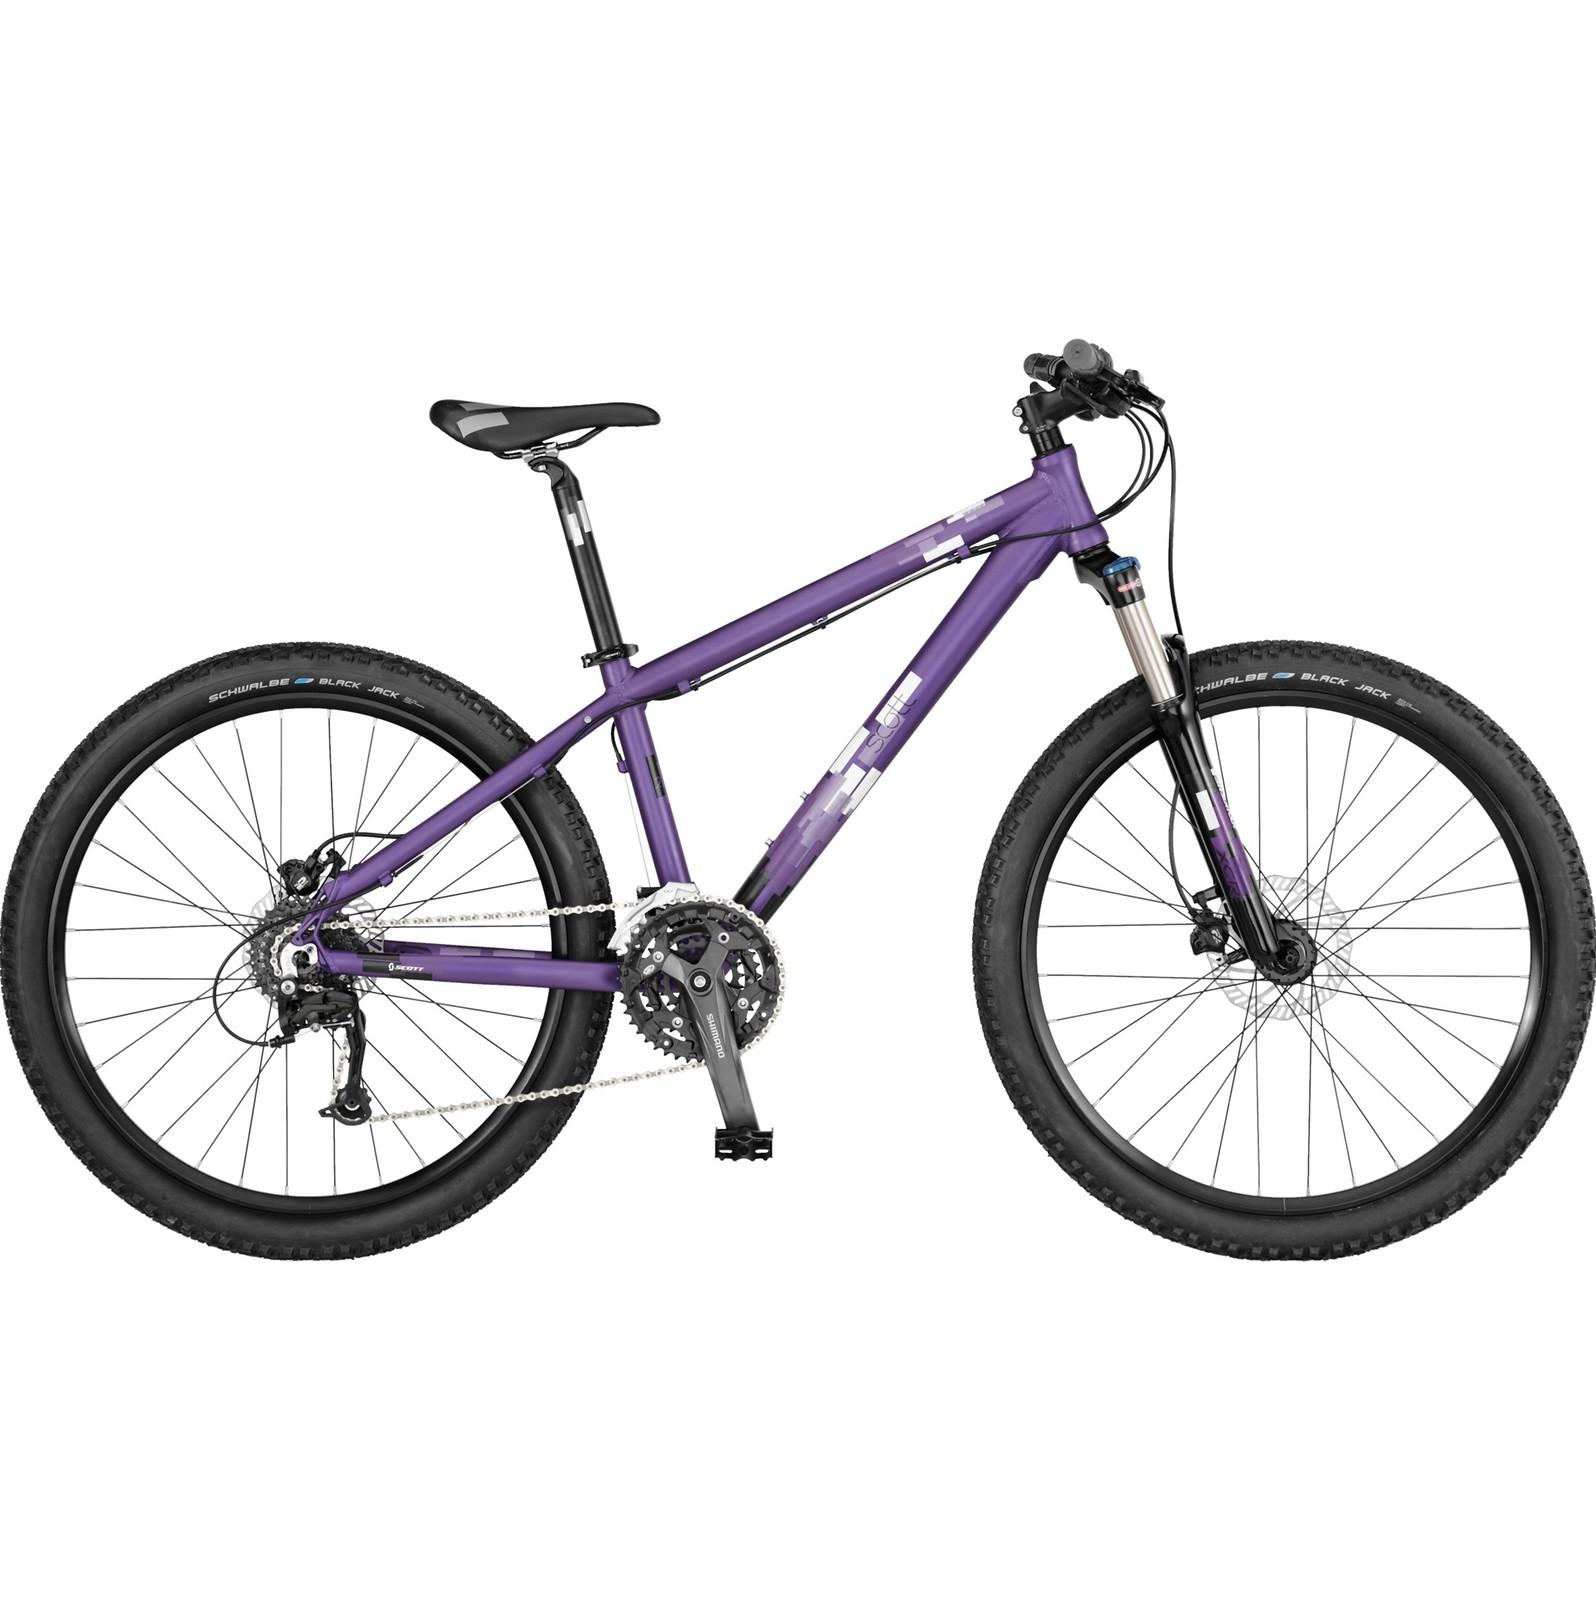 2012 Scott Contessa 20 (Womens) Bike 221785